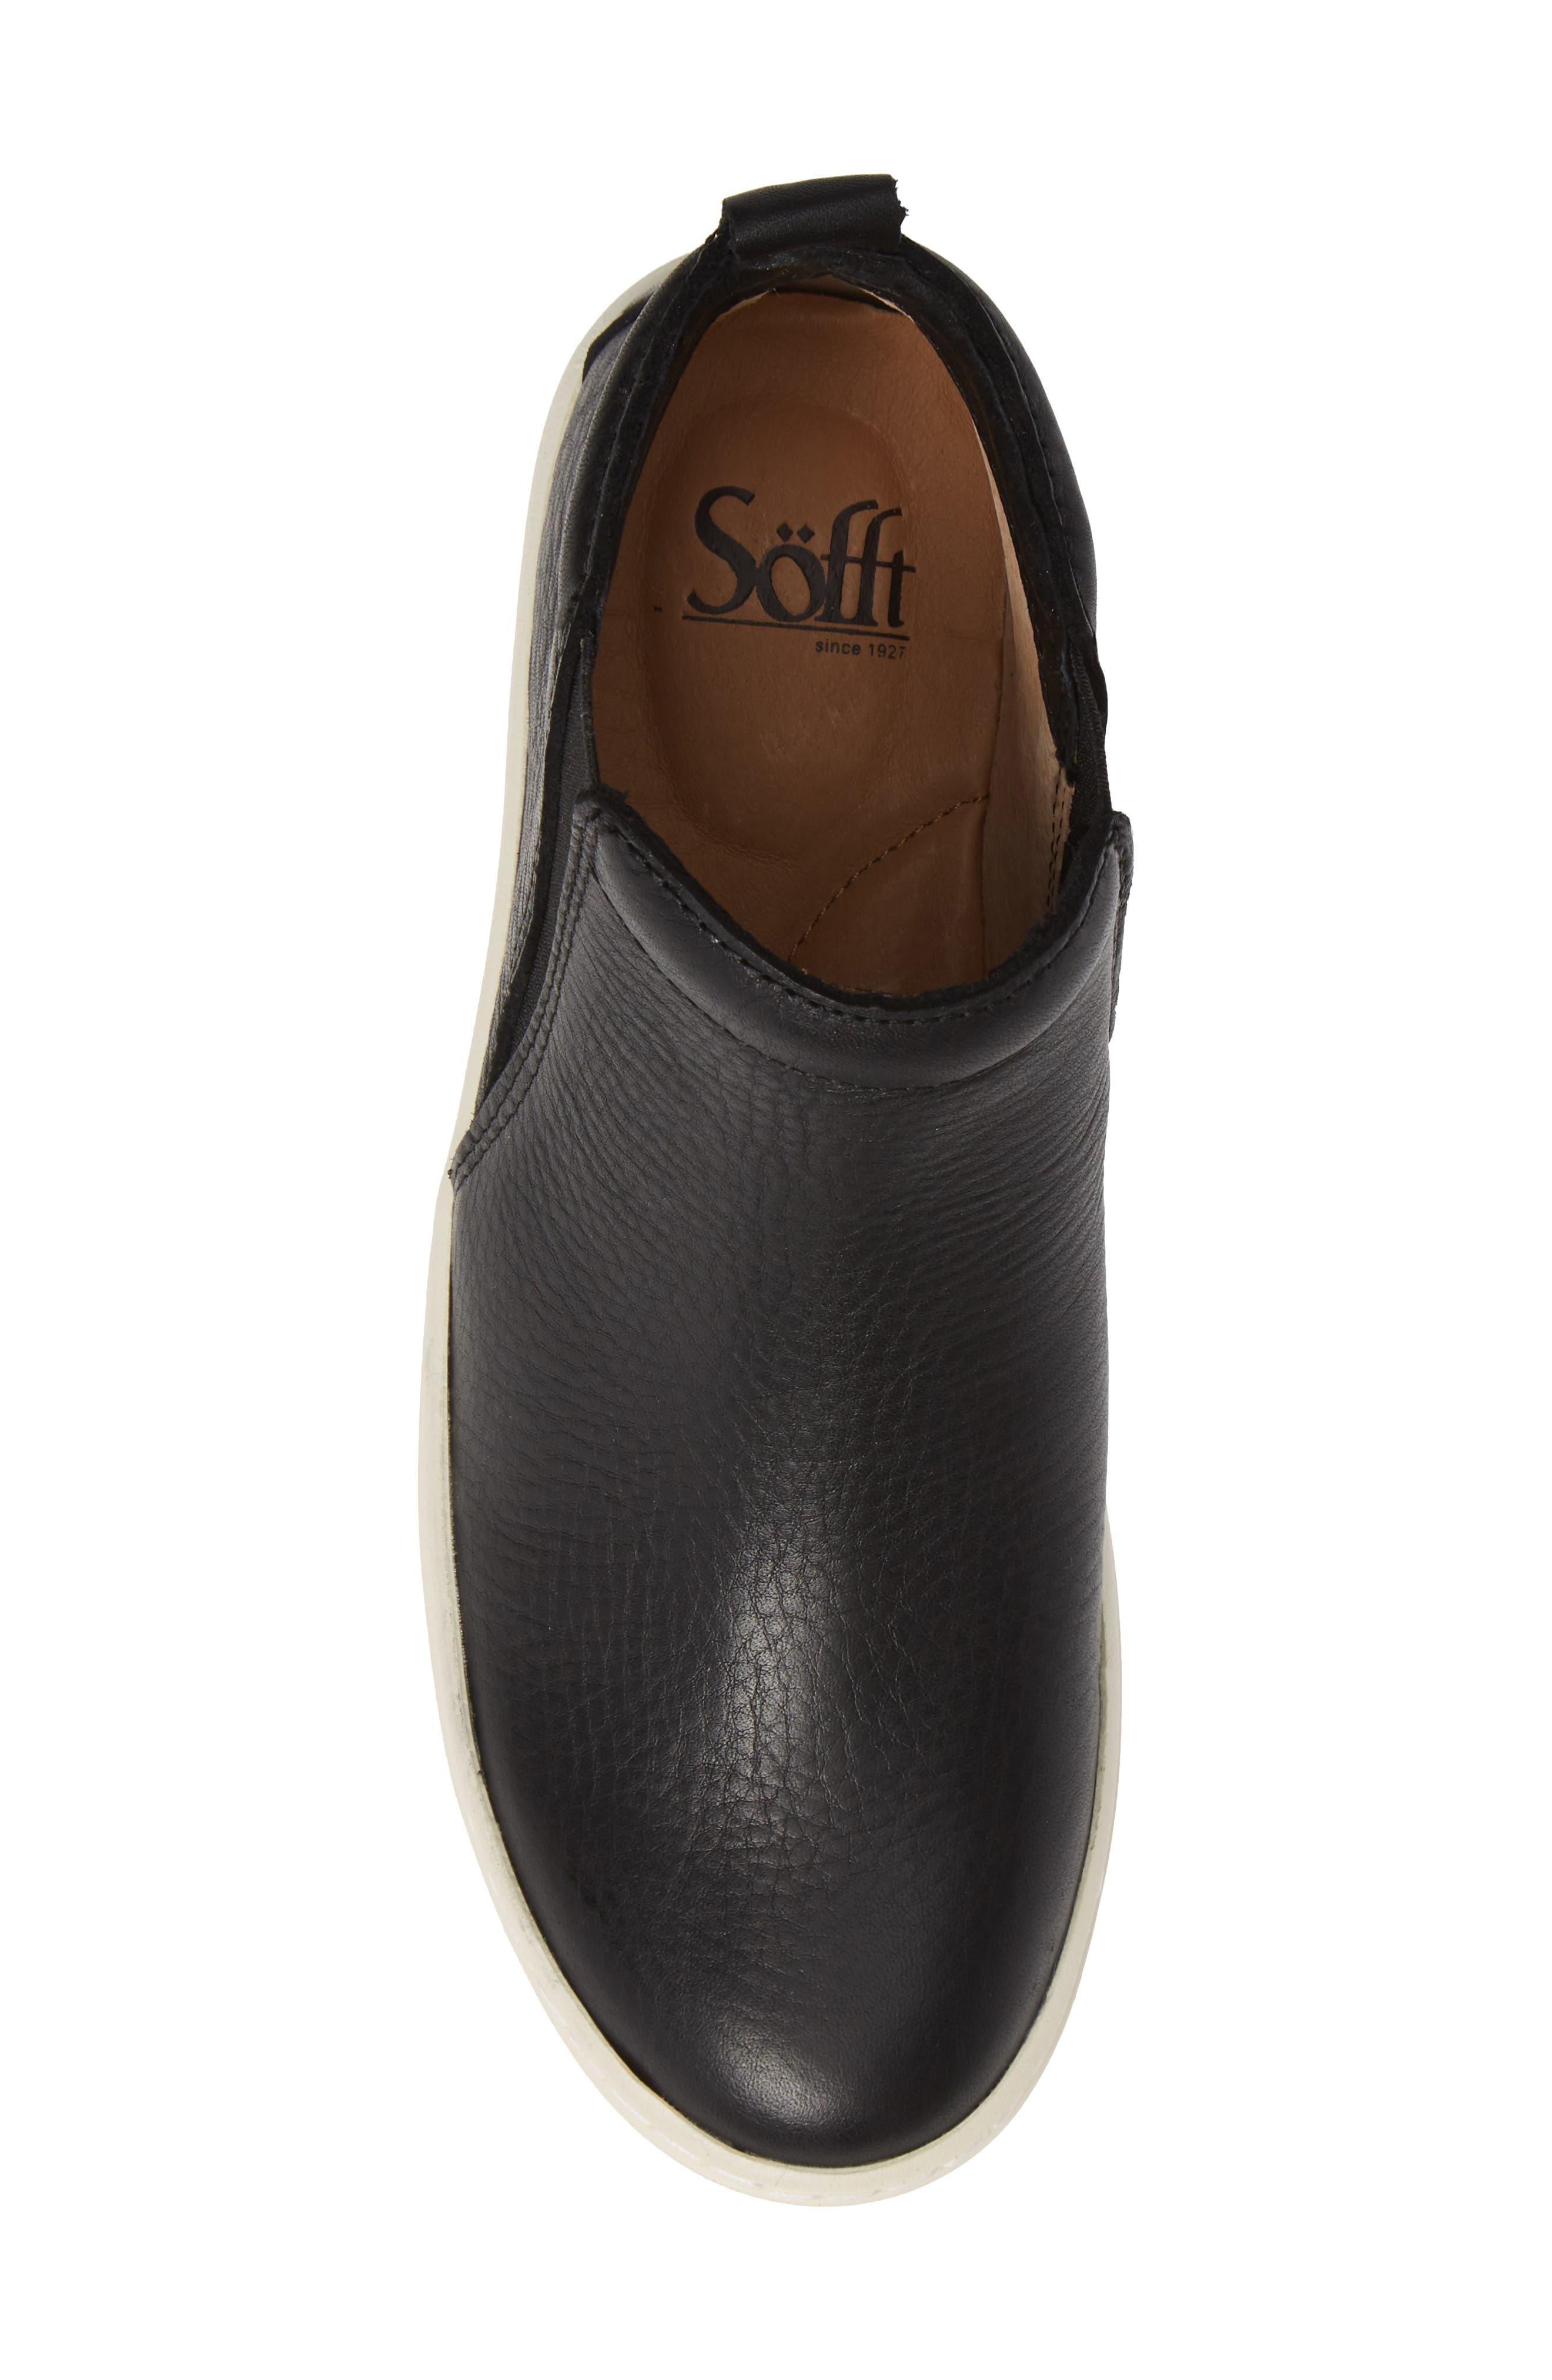 SÖFFT, Britton II Waterproof Sneaker Bootie, Alternate thumbnail 5, color, BLACK LEATHER